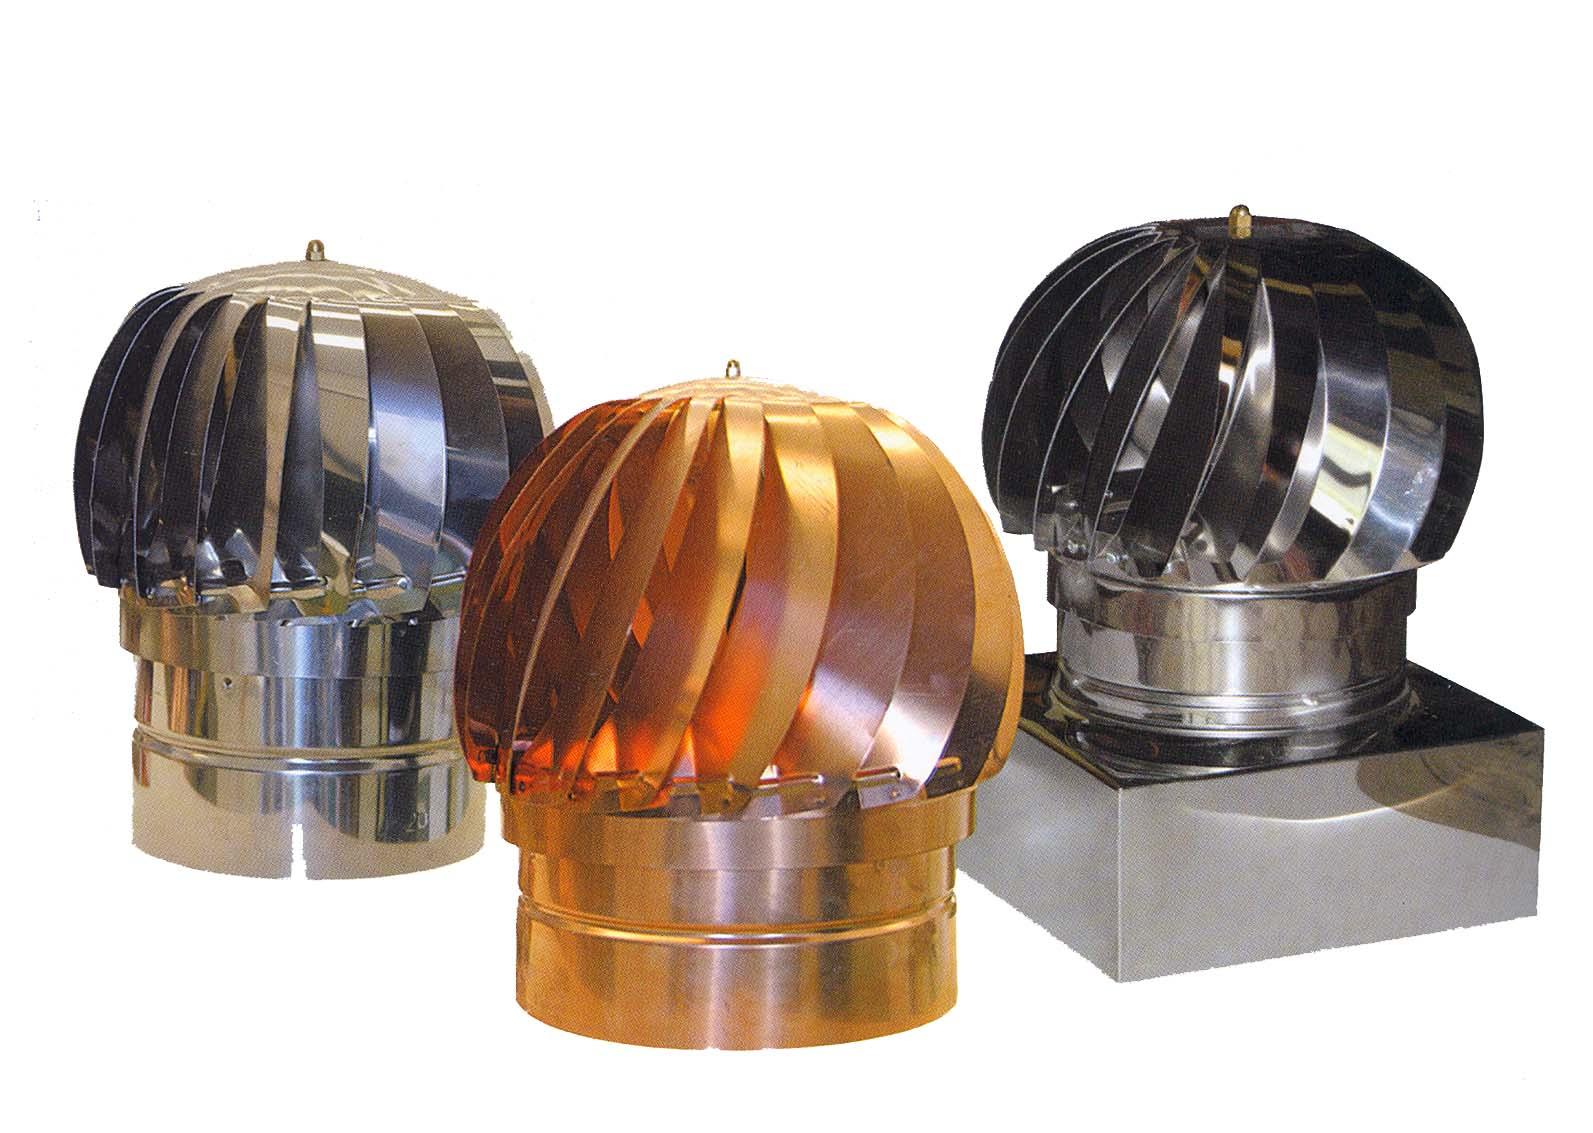 Terminali per canne fumarie termosifoni in ghisa scheda - Bagno punta canna sottomarina ...